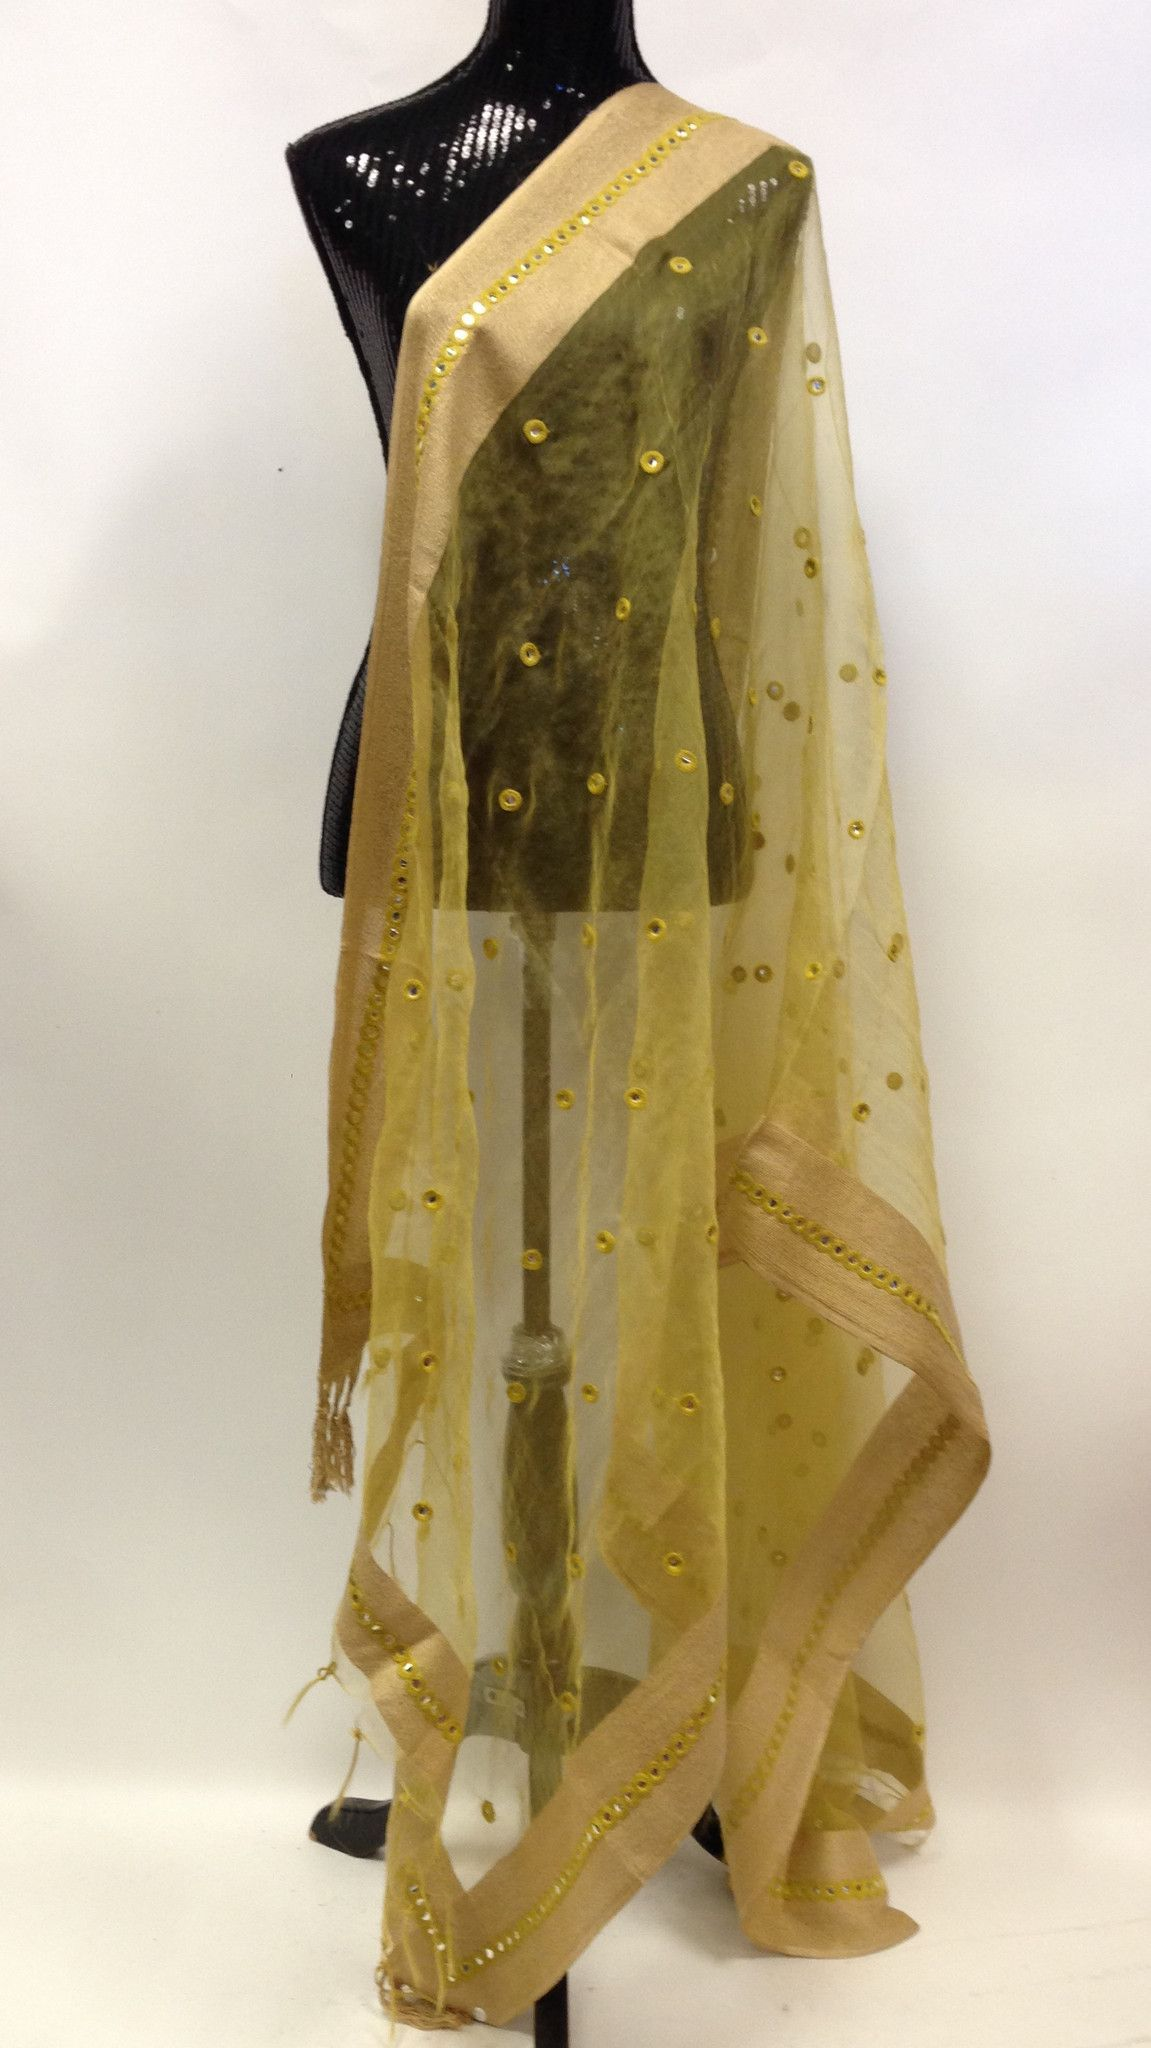 Mirror Work Dupatta - Golden   Dupatta   Pinterest   Dress designs ...